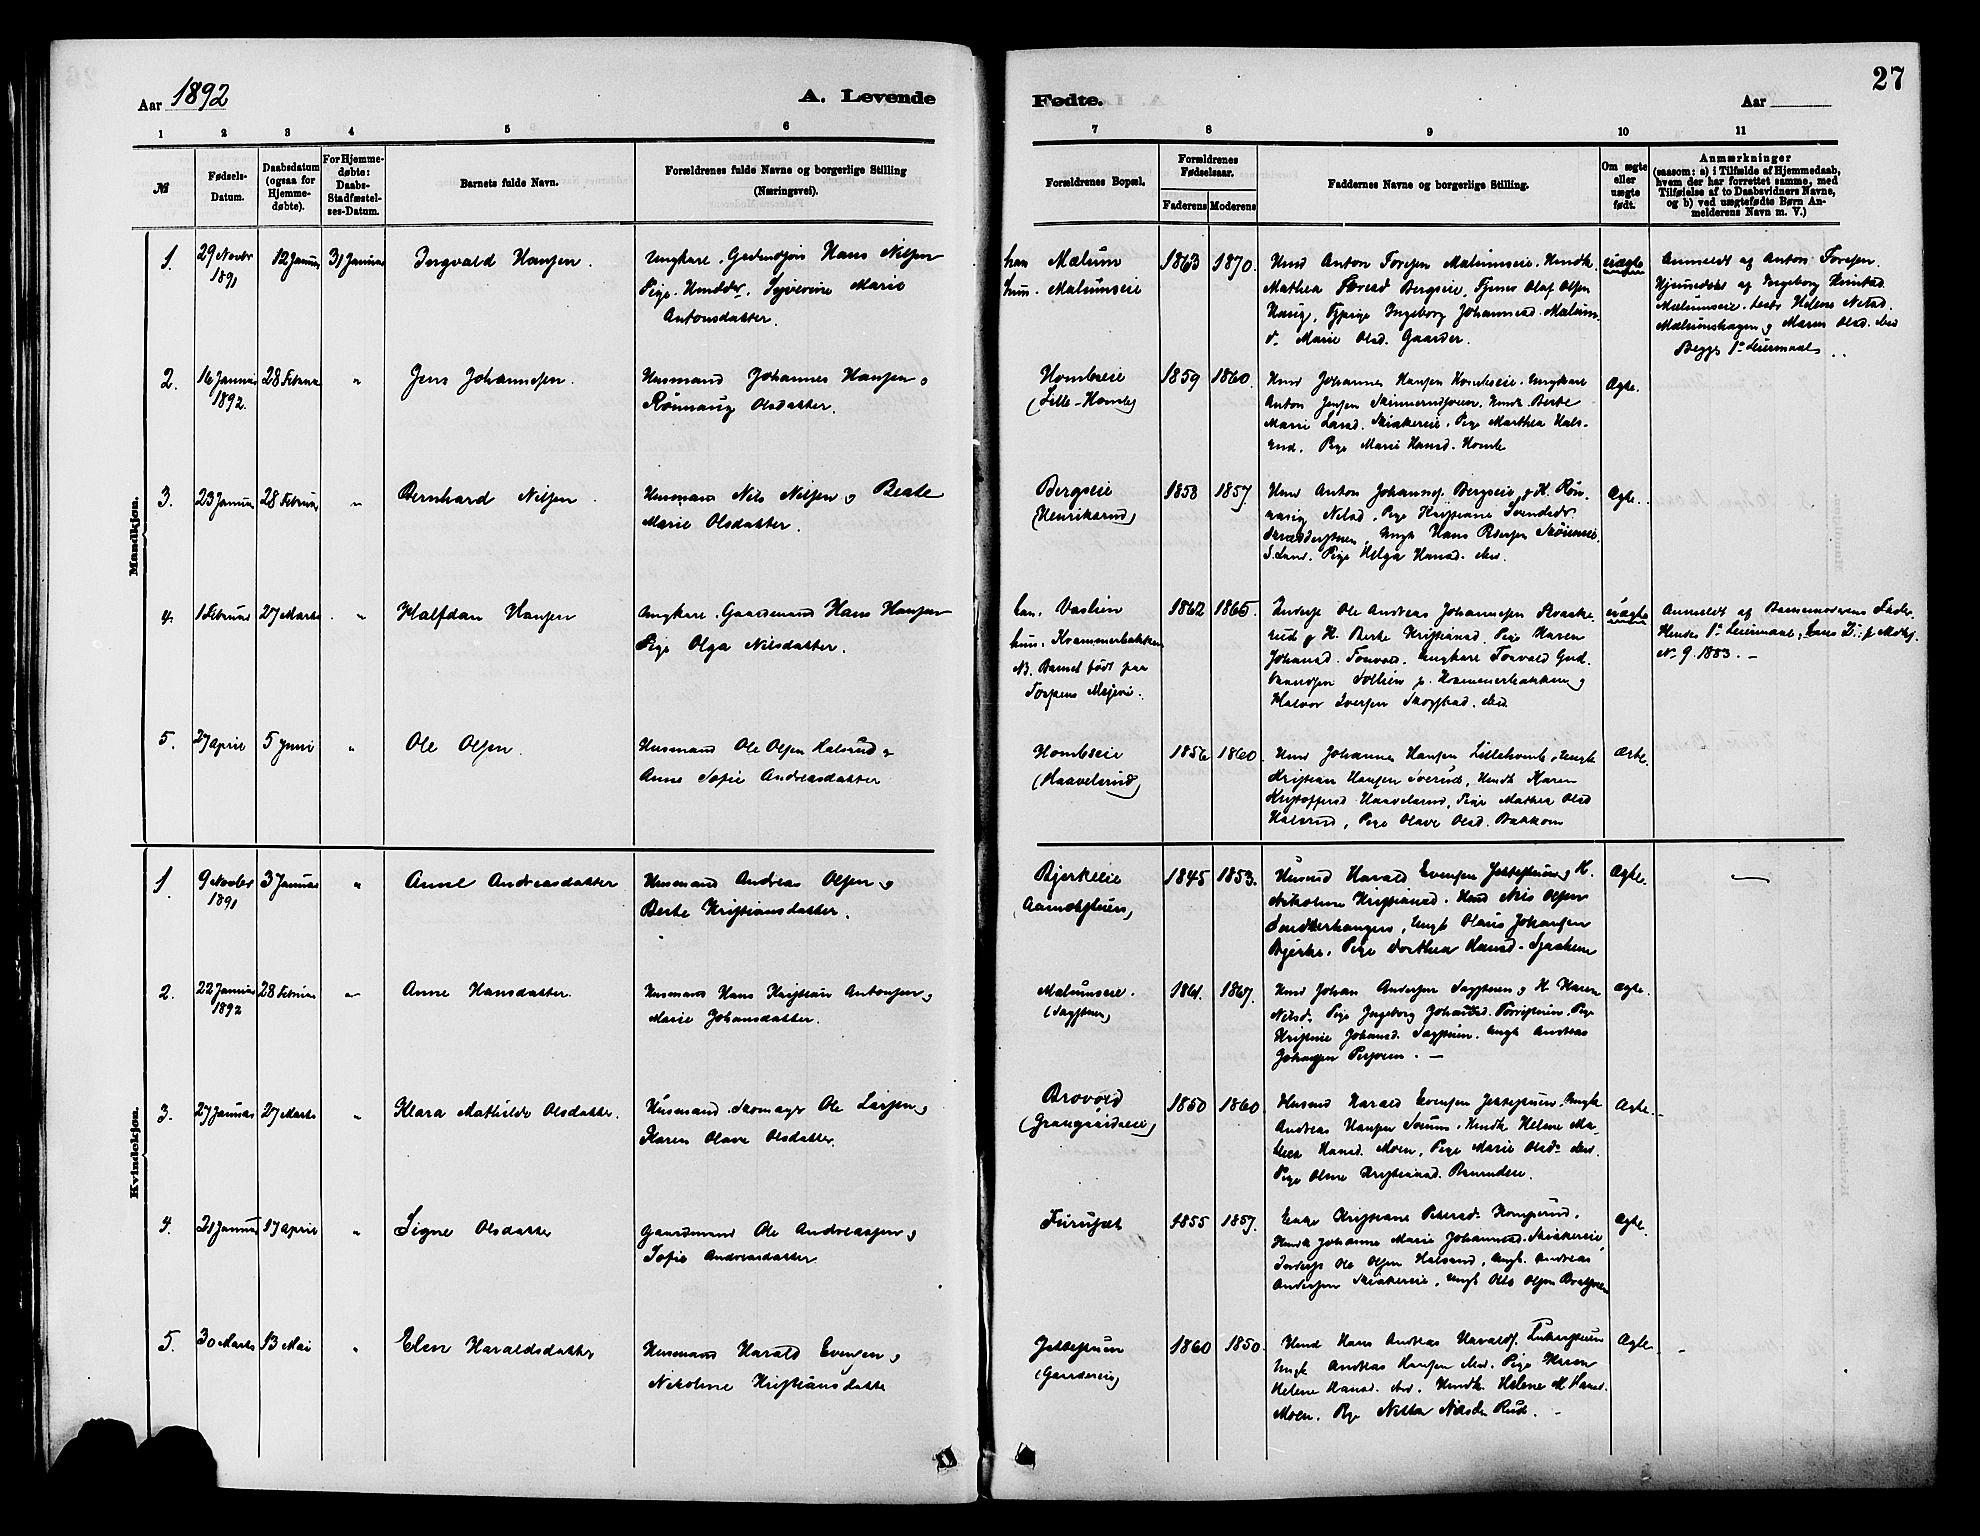 SAH, Nordre Land prestekontor, Ministerialbok nr. 3, 1882-1896, s. 27